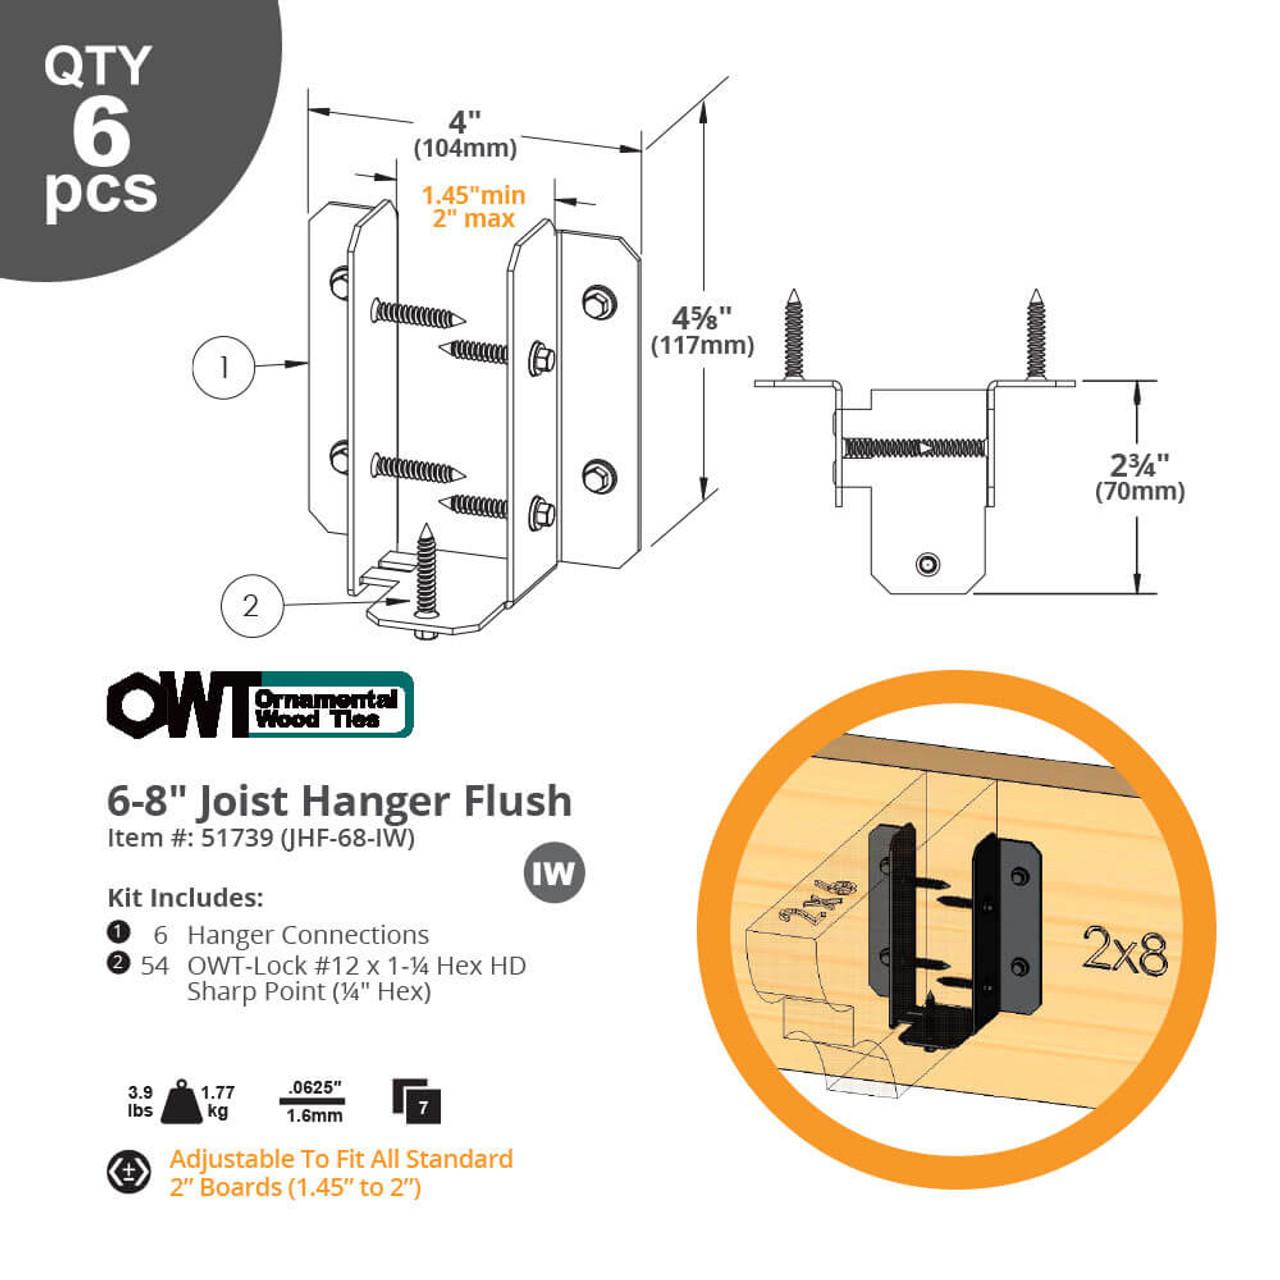 Joist Hanger Flush Drawing from OZCO Ornamental Wood Ties